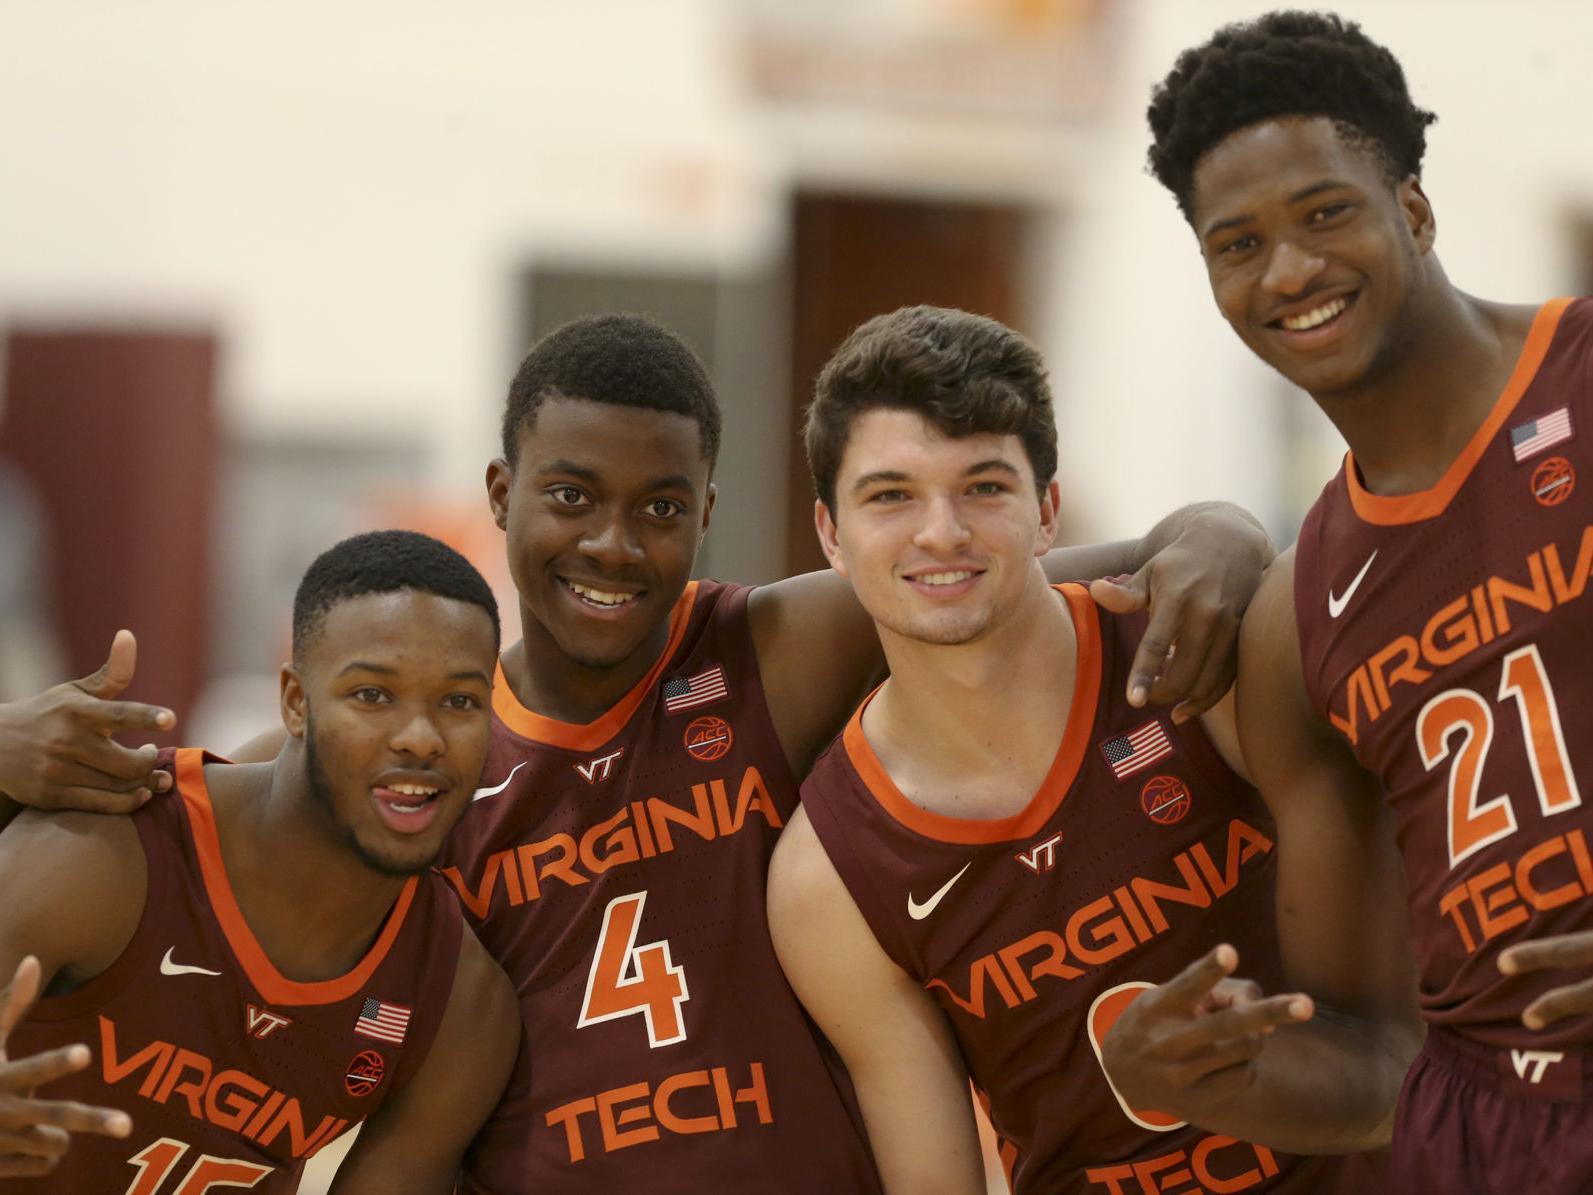 Season Of Change For Virginia Tech Men S Basketball Virginia Tech Roanoke Com